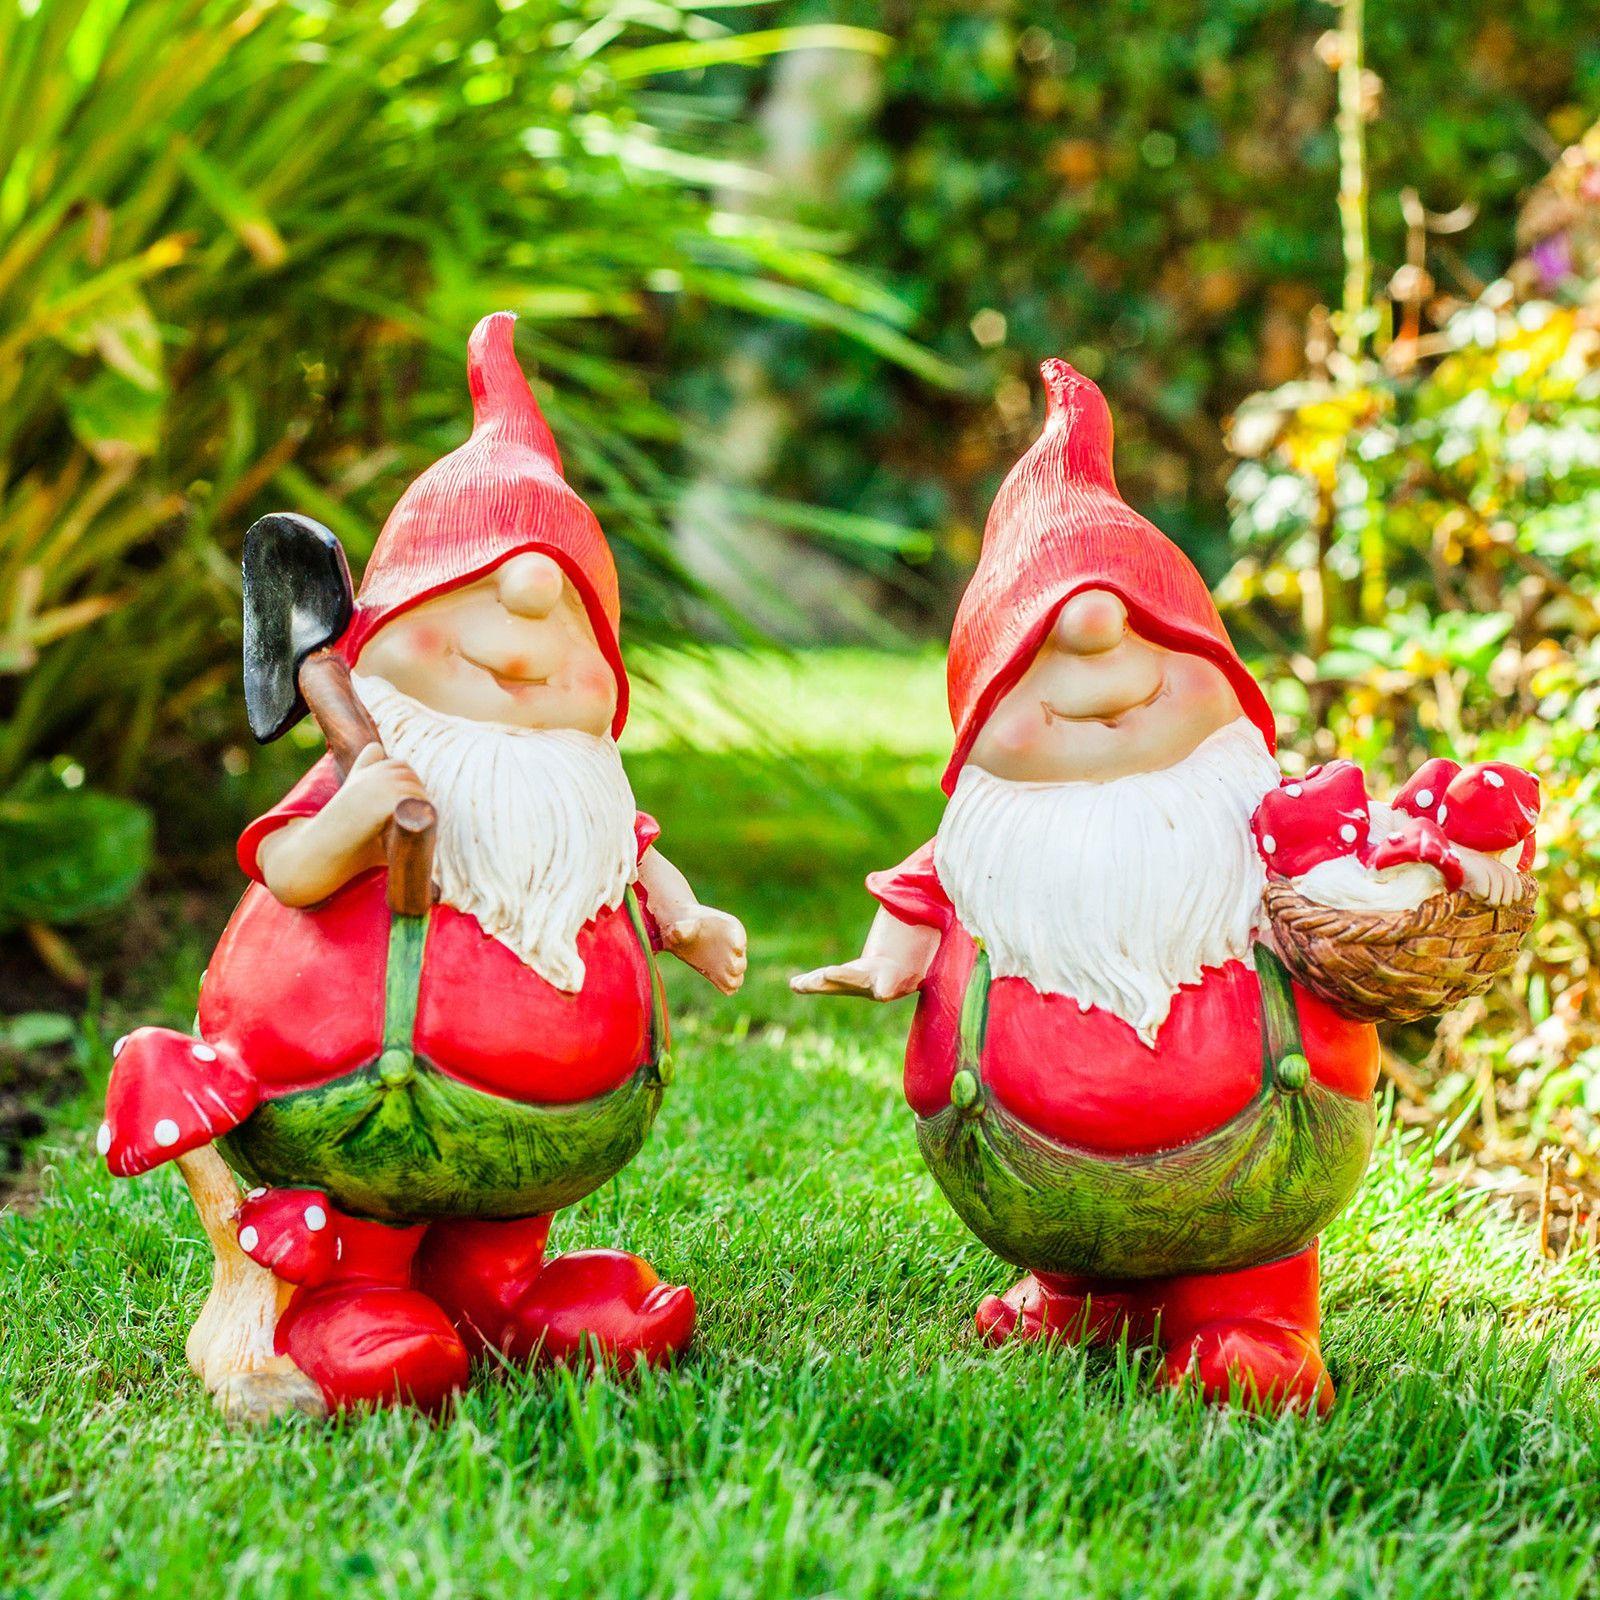 Garden Gnomes Max & Mason the Pair of Red Mushroom Picking